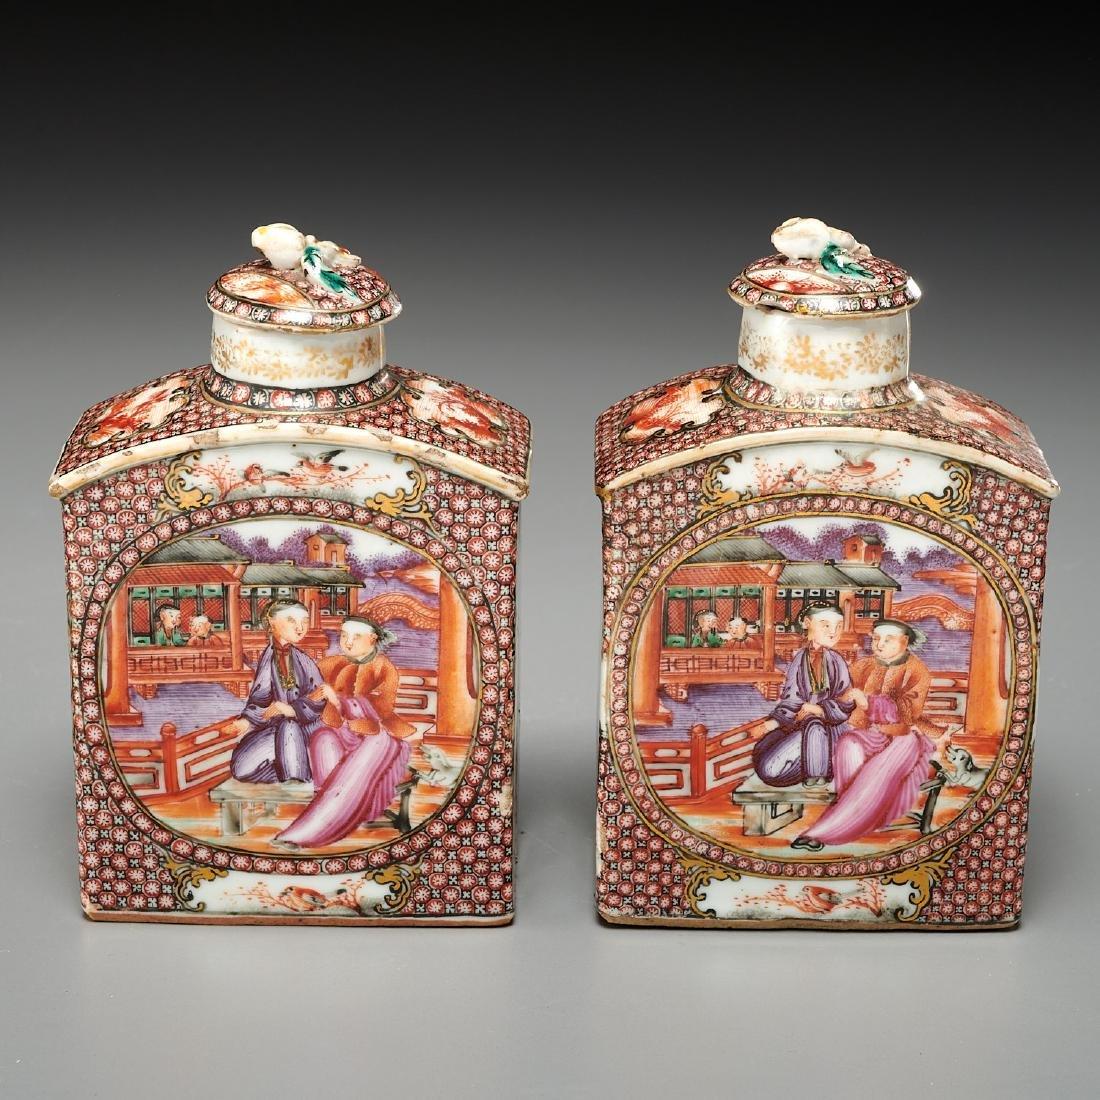 (2) Chinese Export Rockefeller pattern tea caddies